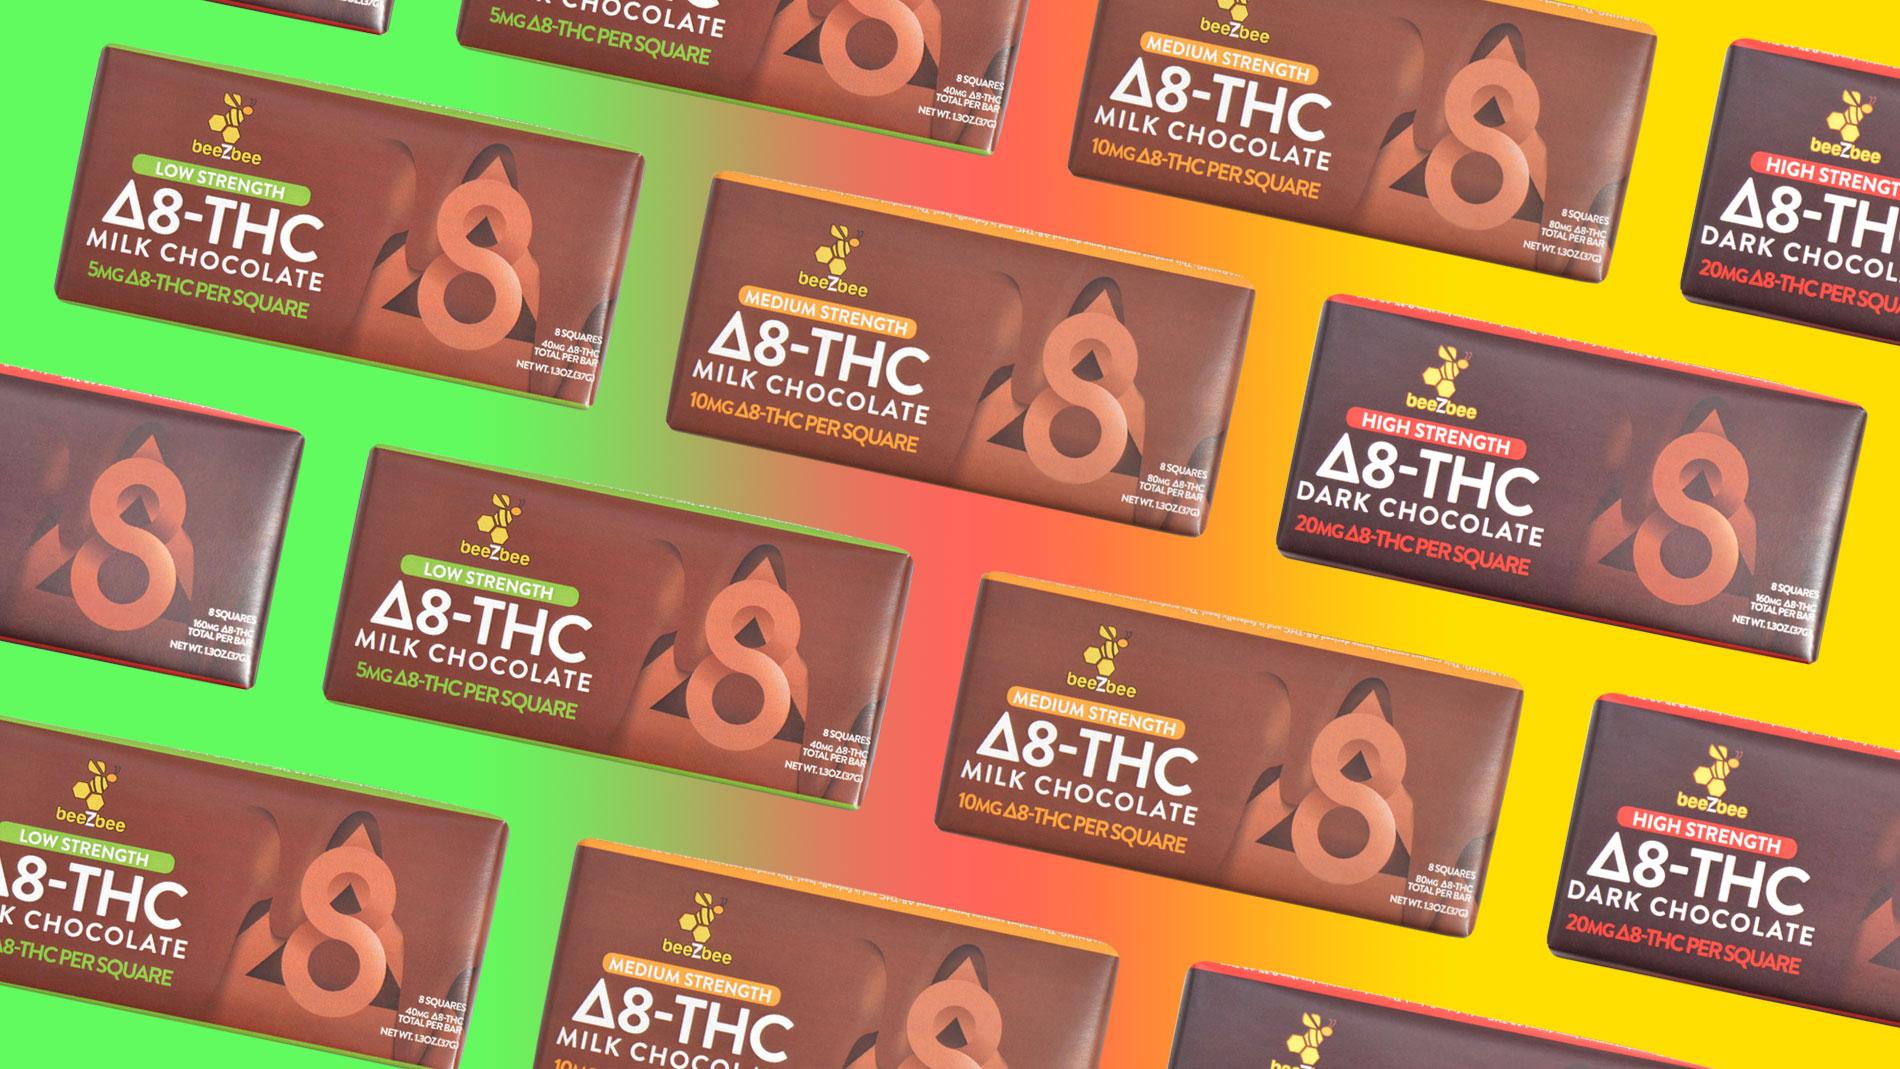 Delta-8 THC edibles offer legal high in Missouri